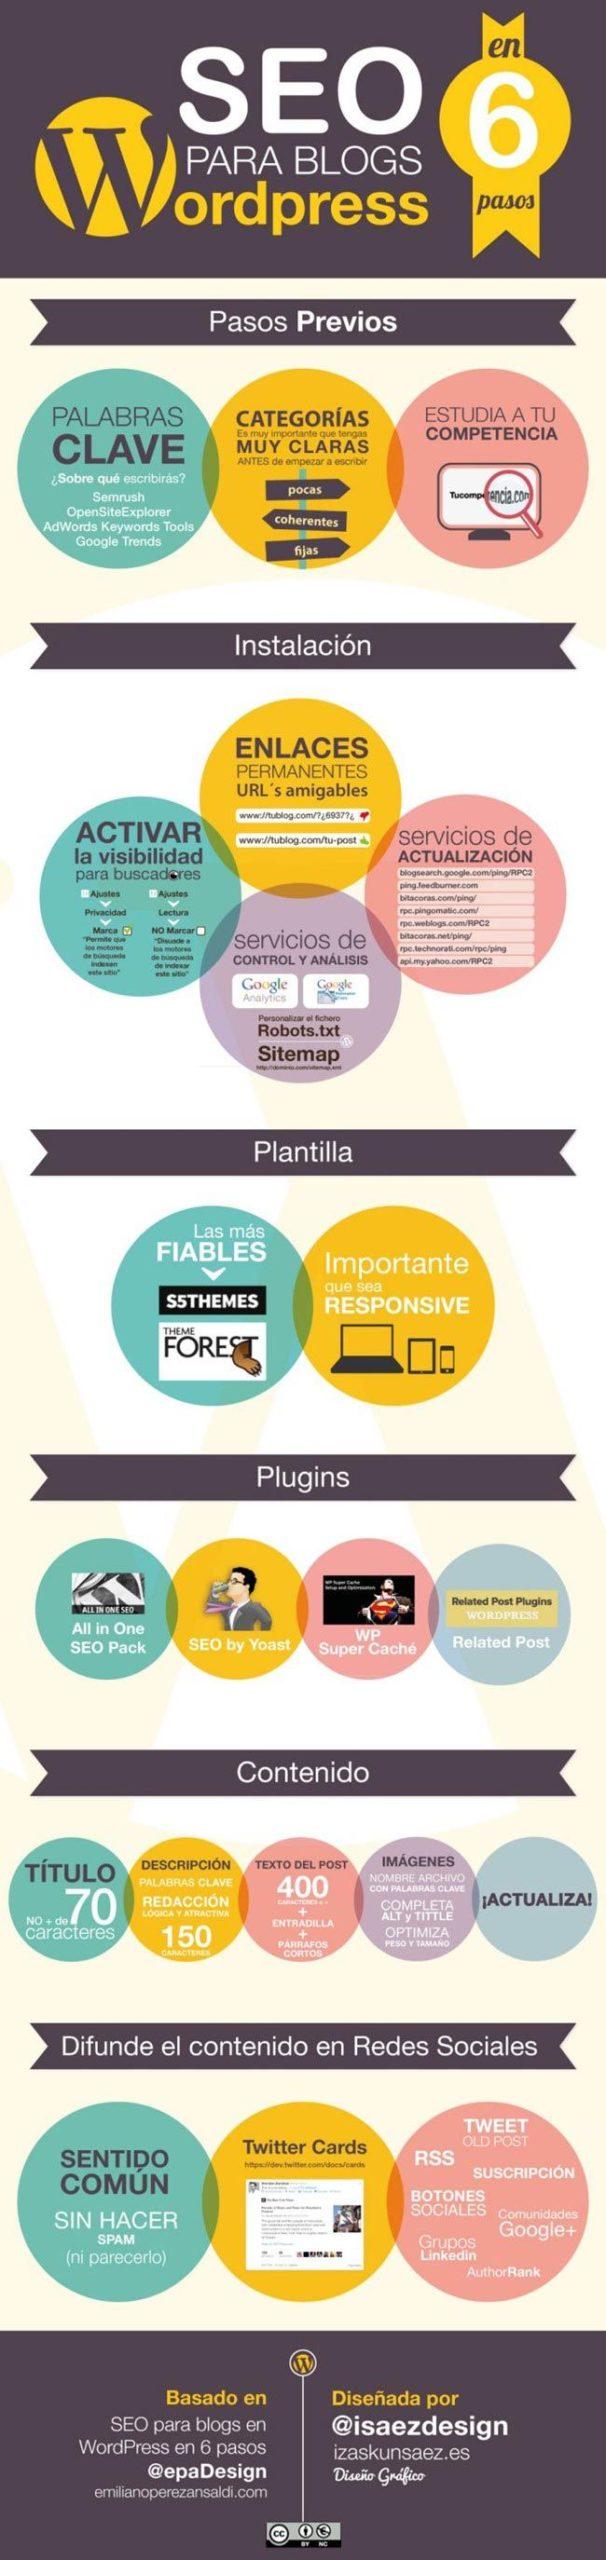 Infografia - SEO para WordPress. Infografía sonbrwe WordPress | CORBAXSEO